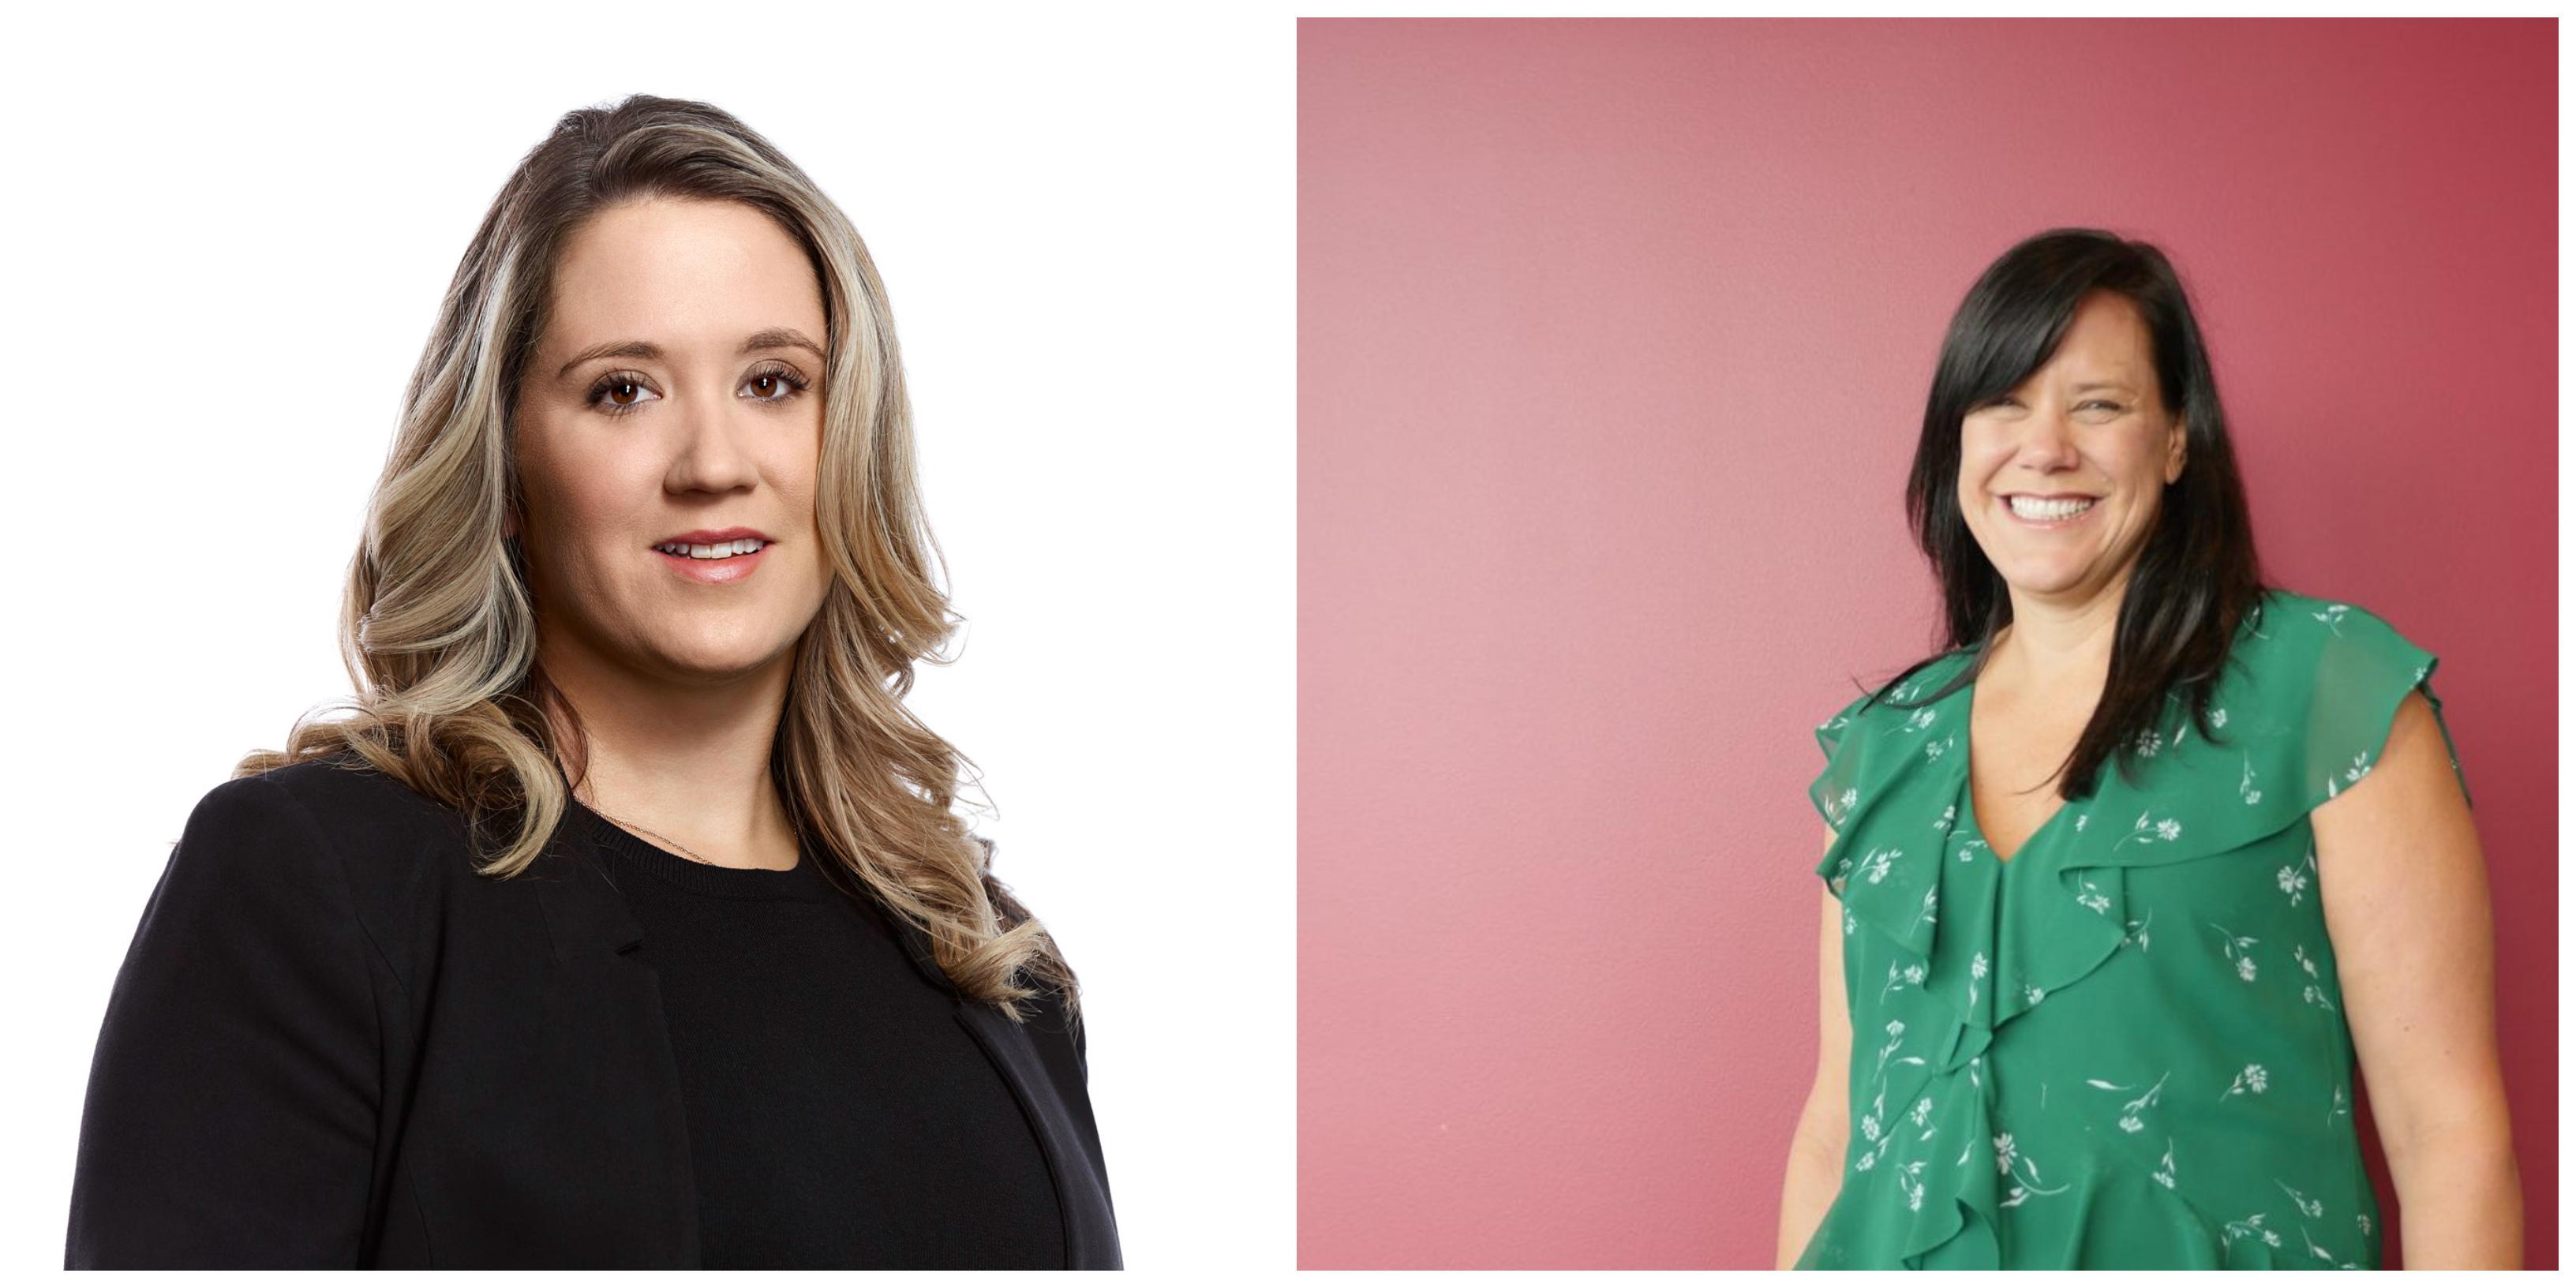 UnLtd announces new social impact projects; adds Karen Halligan + Venessa Hunt to Board